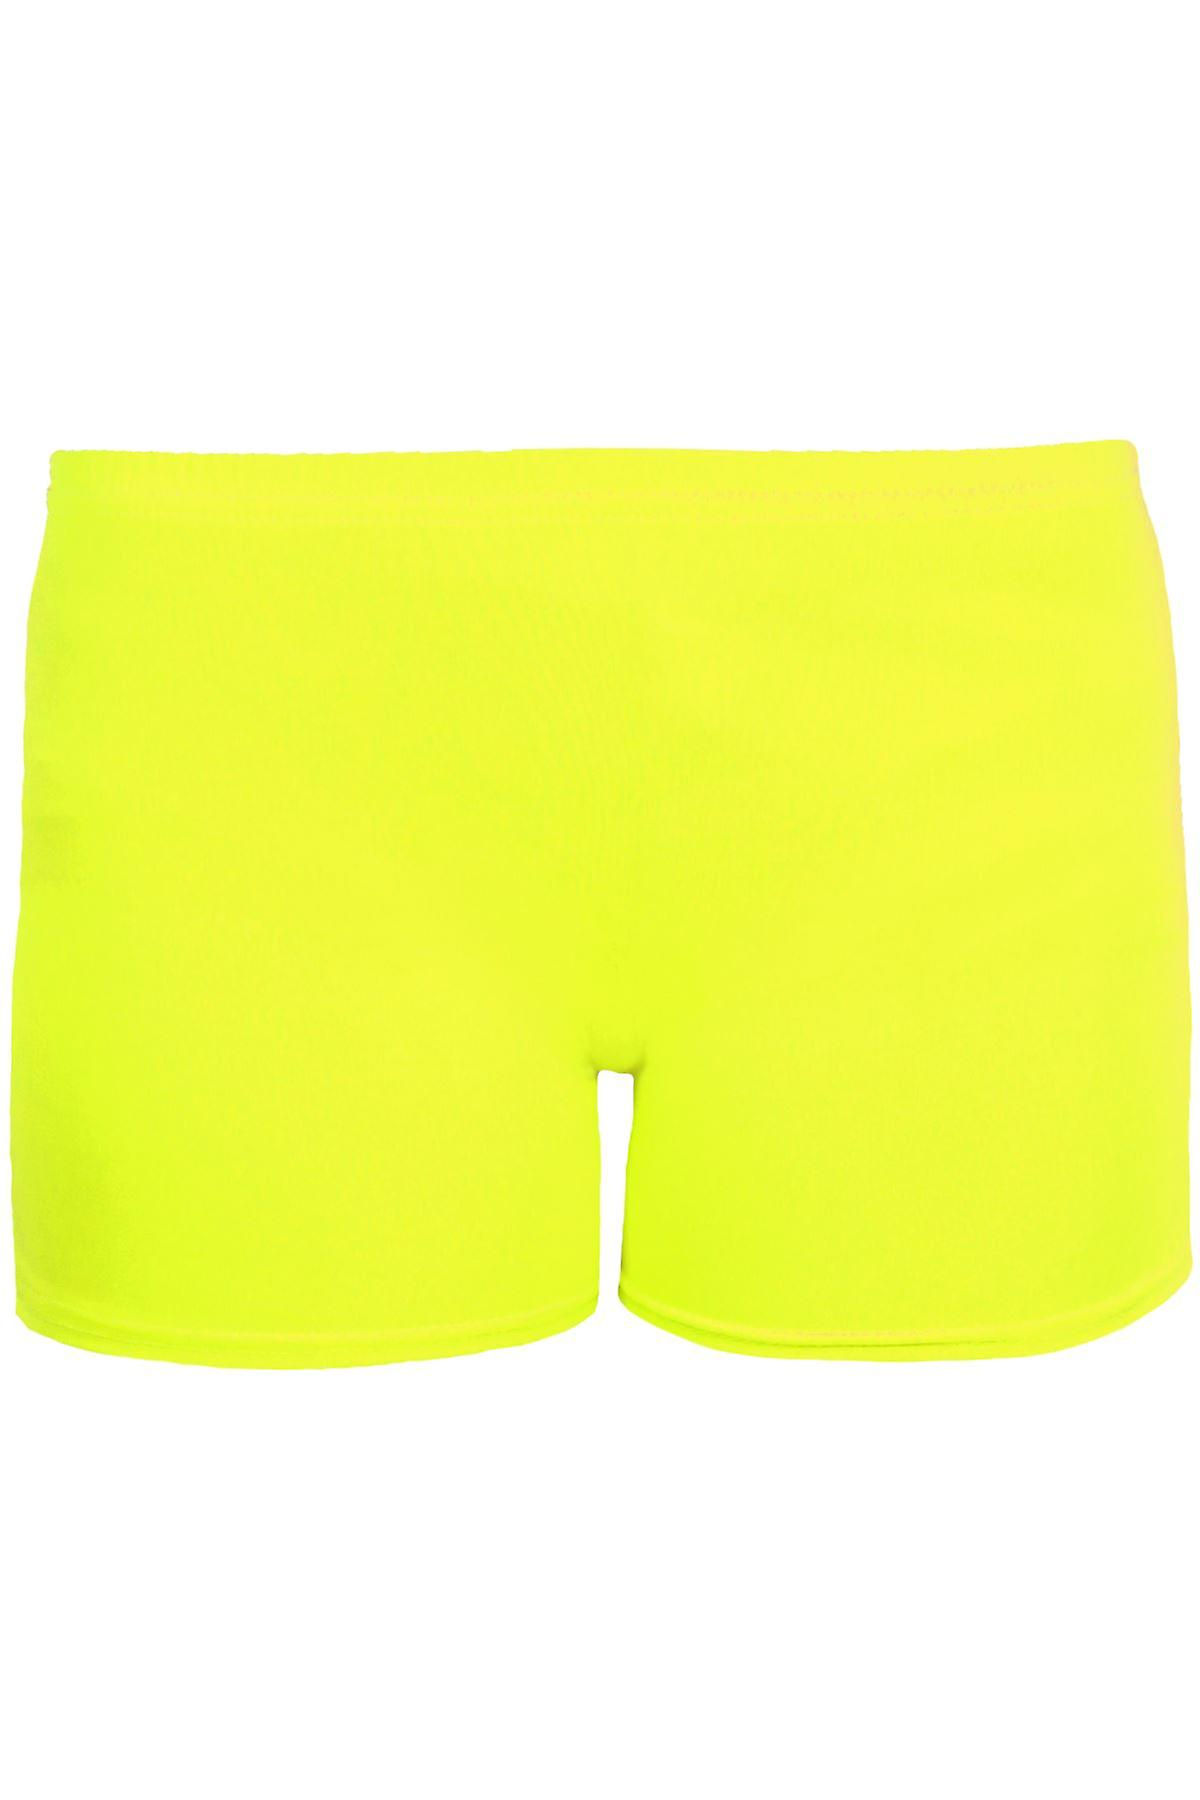 Girls Cotton Lycra Stretch Gym Gymastics Dance Children's Neon Hot Pants Shorts